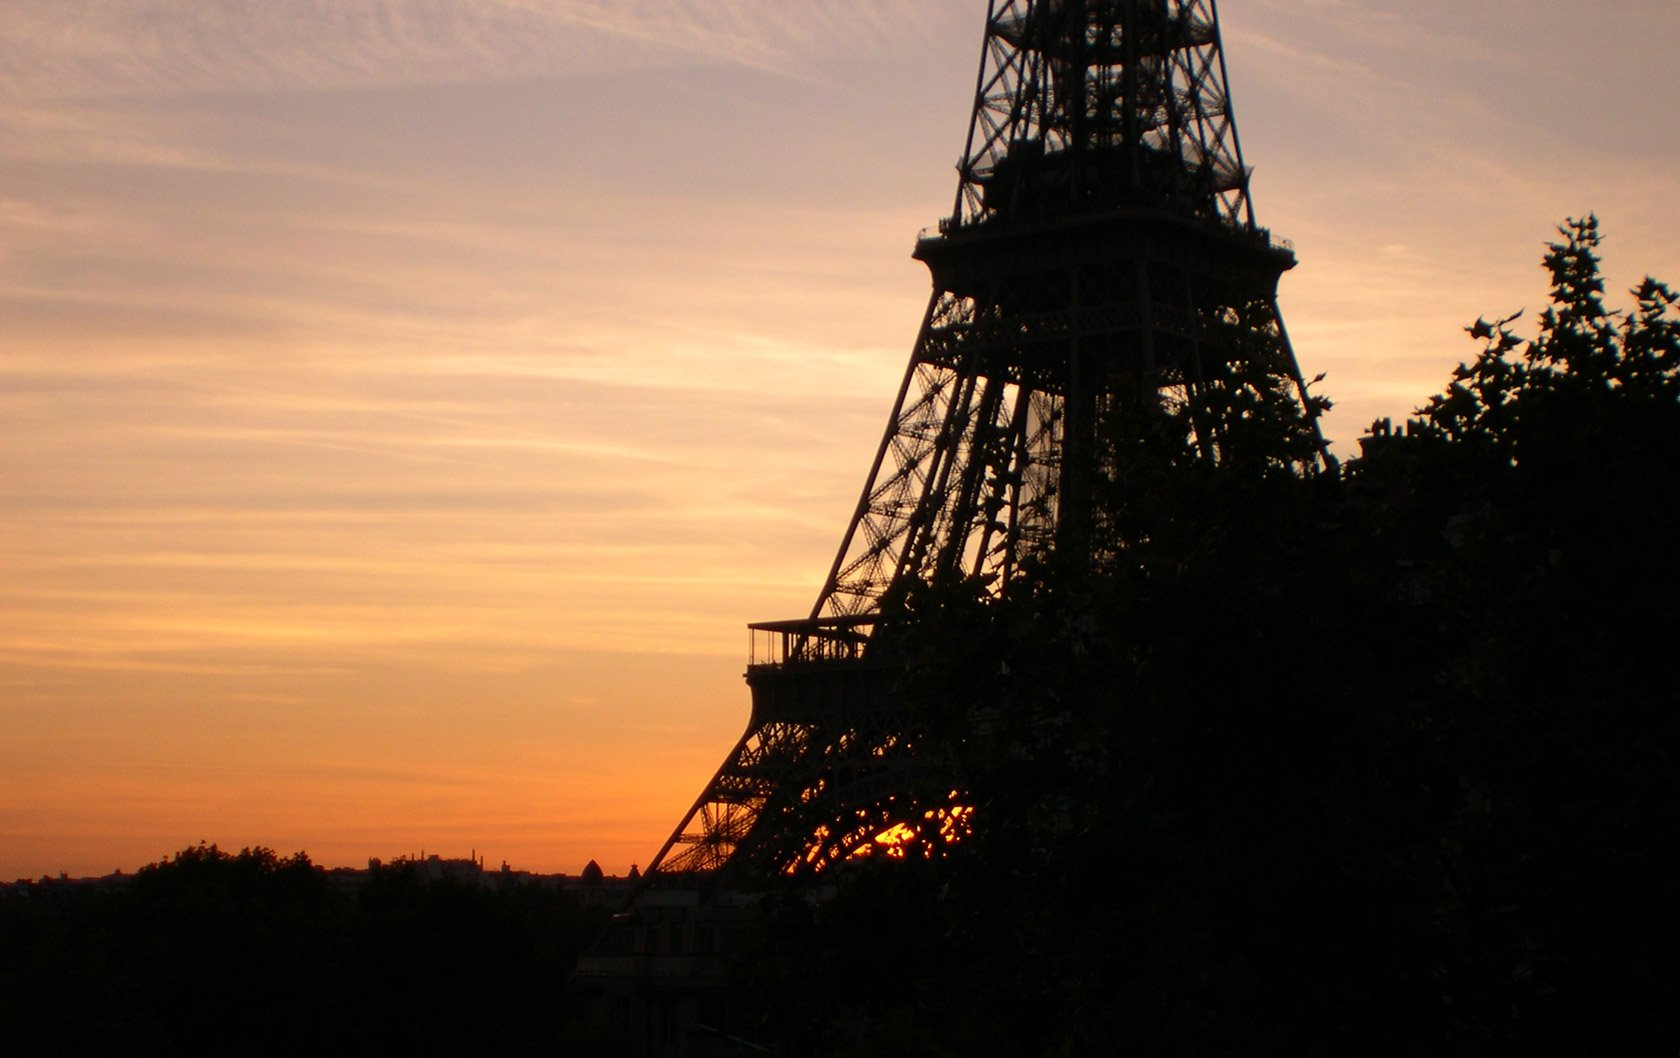 merlot-sunset-2